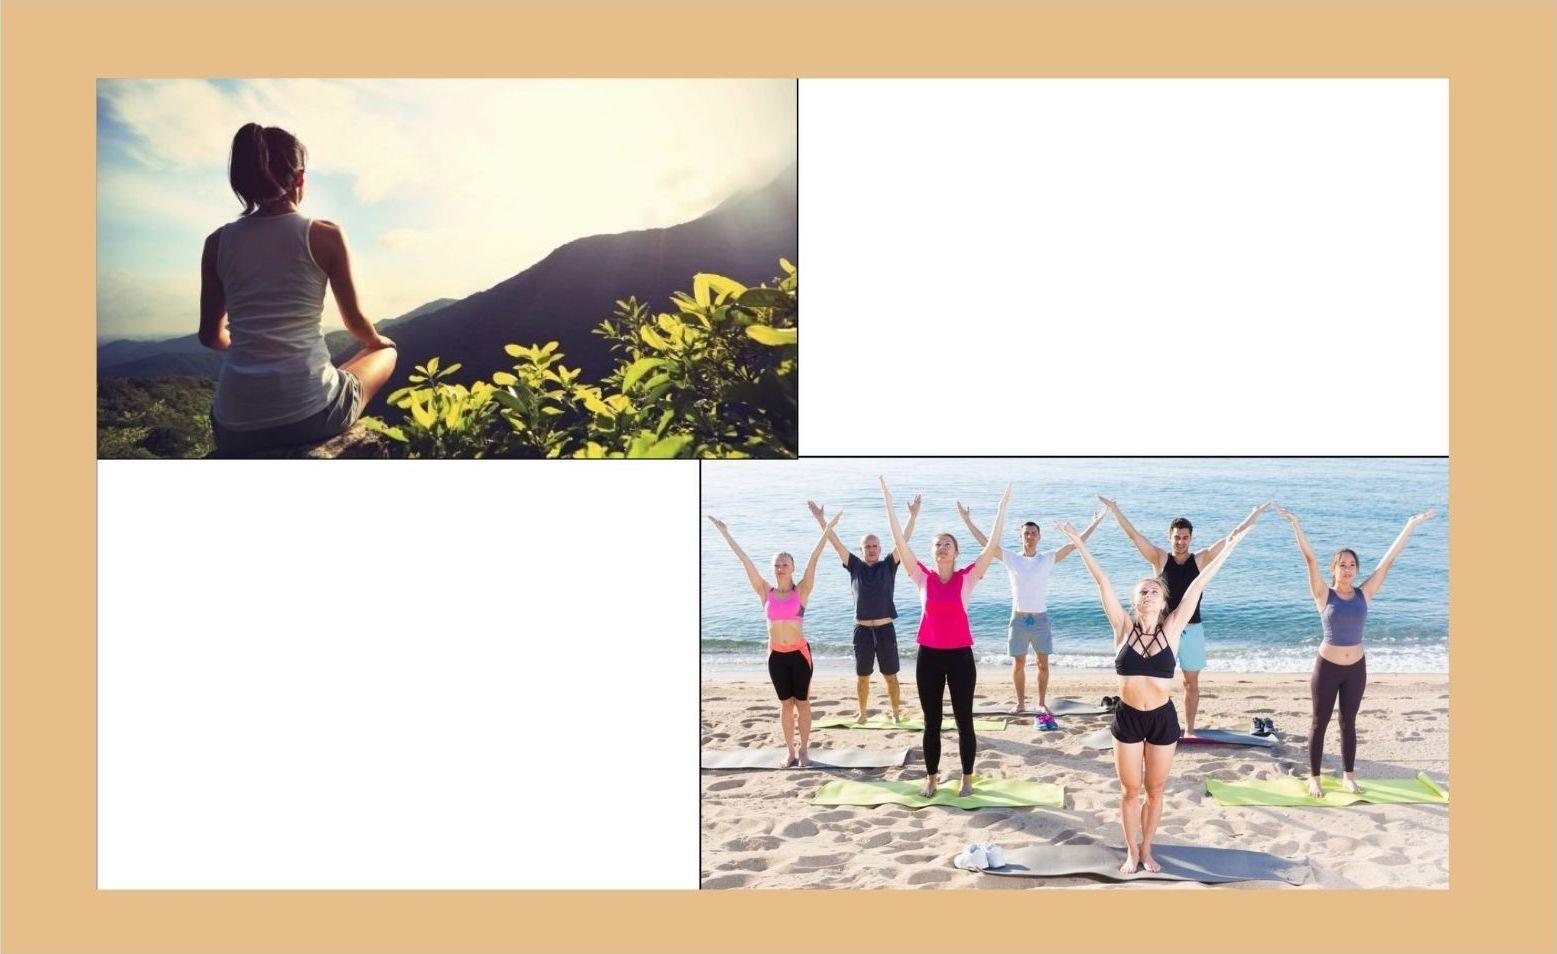 Meditation & Stretching